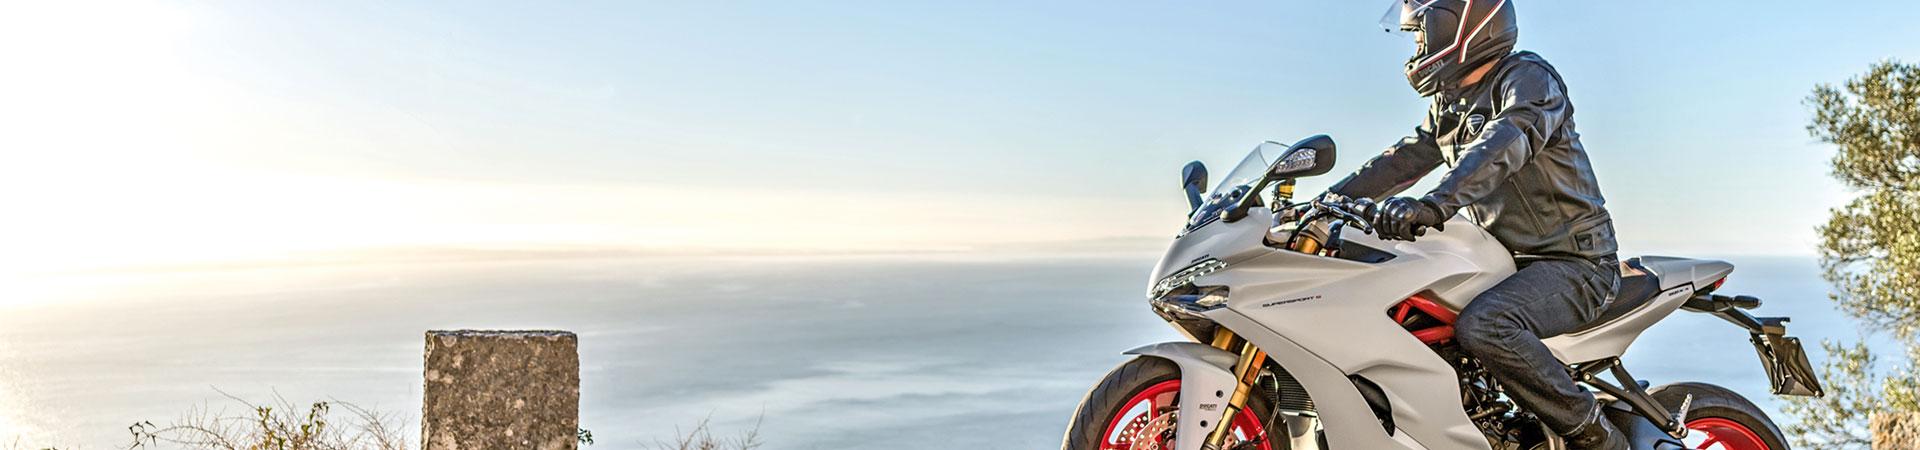 Titelbild-Ducati-Supersport-Modell-2017_01-06-2017_c2345